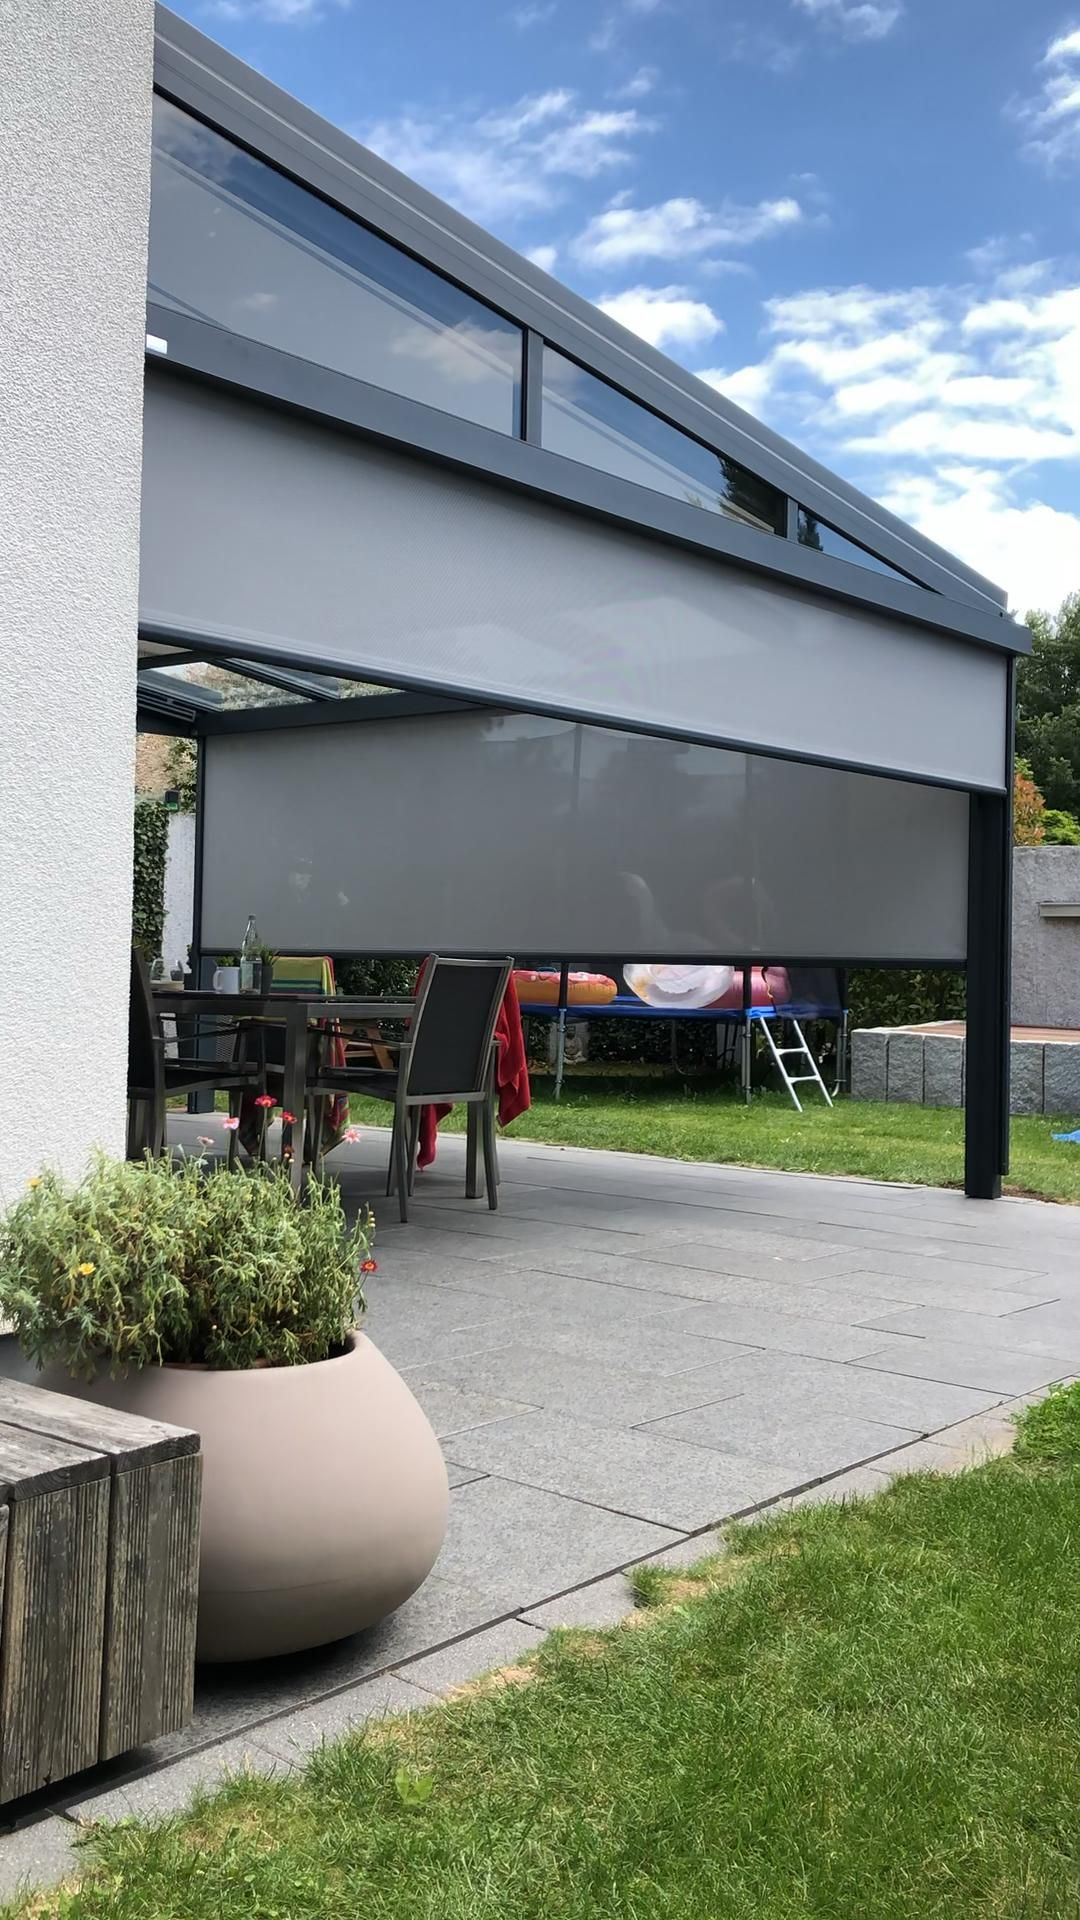 Terrassendach Mit Baschattungen Video En 2020 Techo De Patio Casas De Campo Interiores Diseno De Terraza